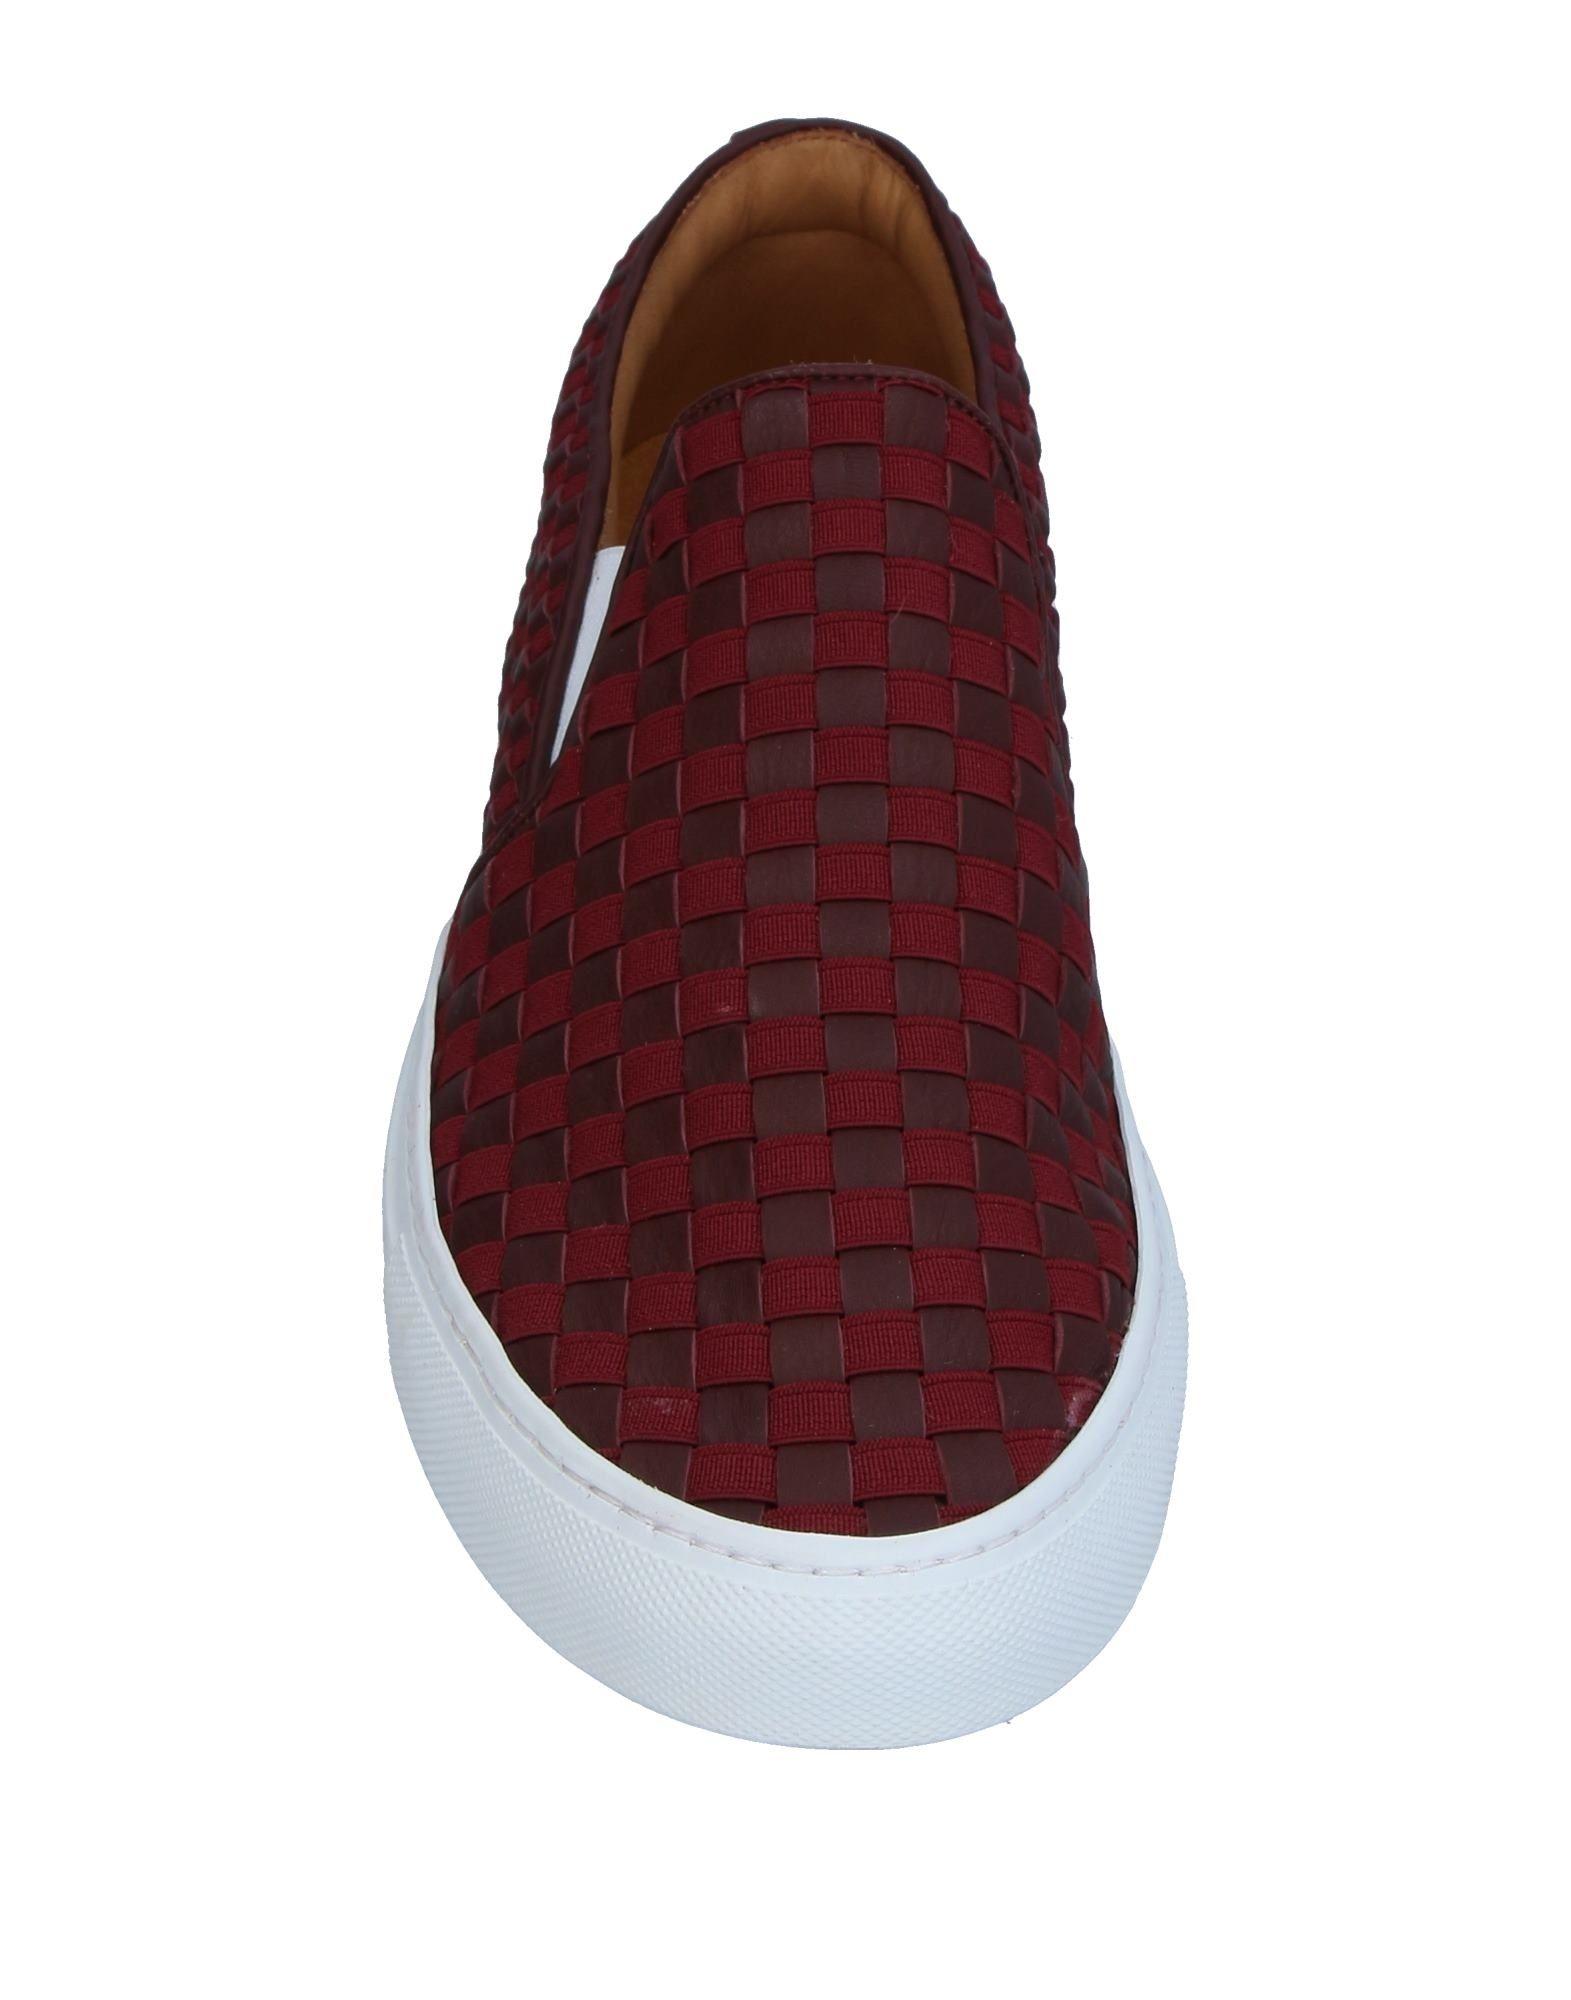 Pantofola D'oro Sneakers - Men Men Men Pantofola D'oro Sneakers online on  Australia - 11353601SG edabaf